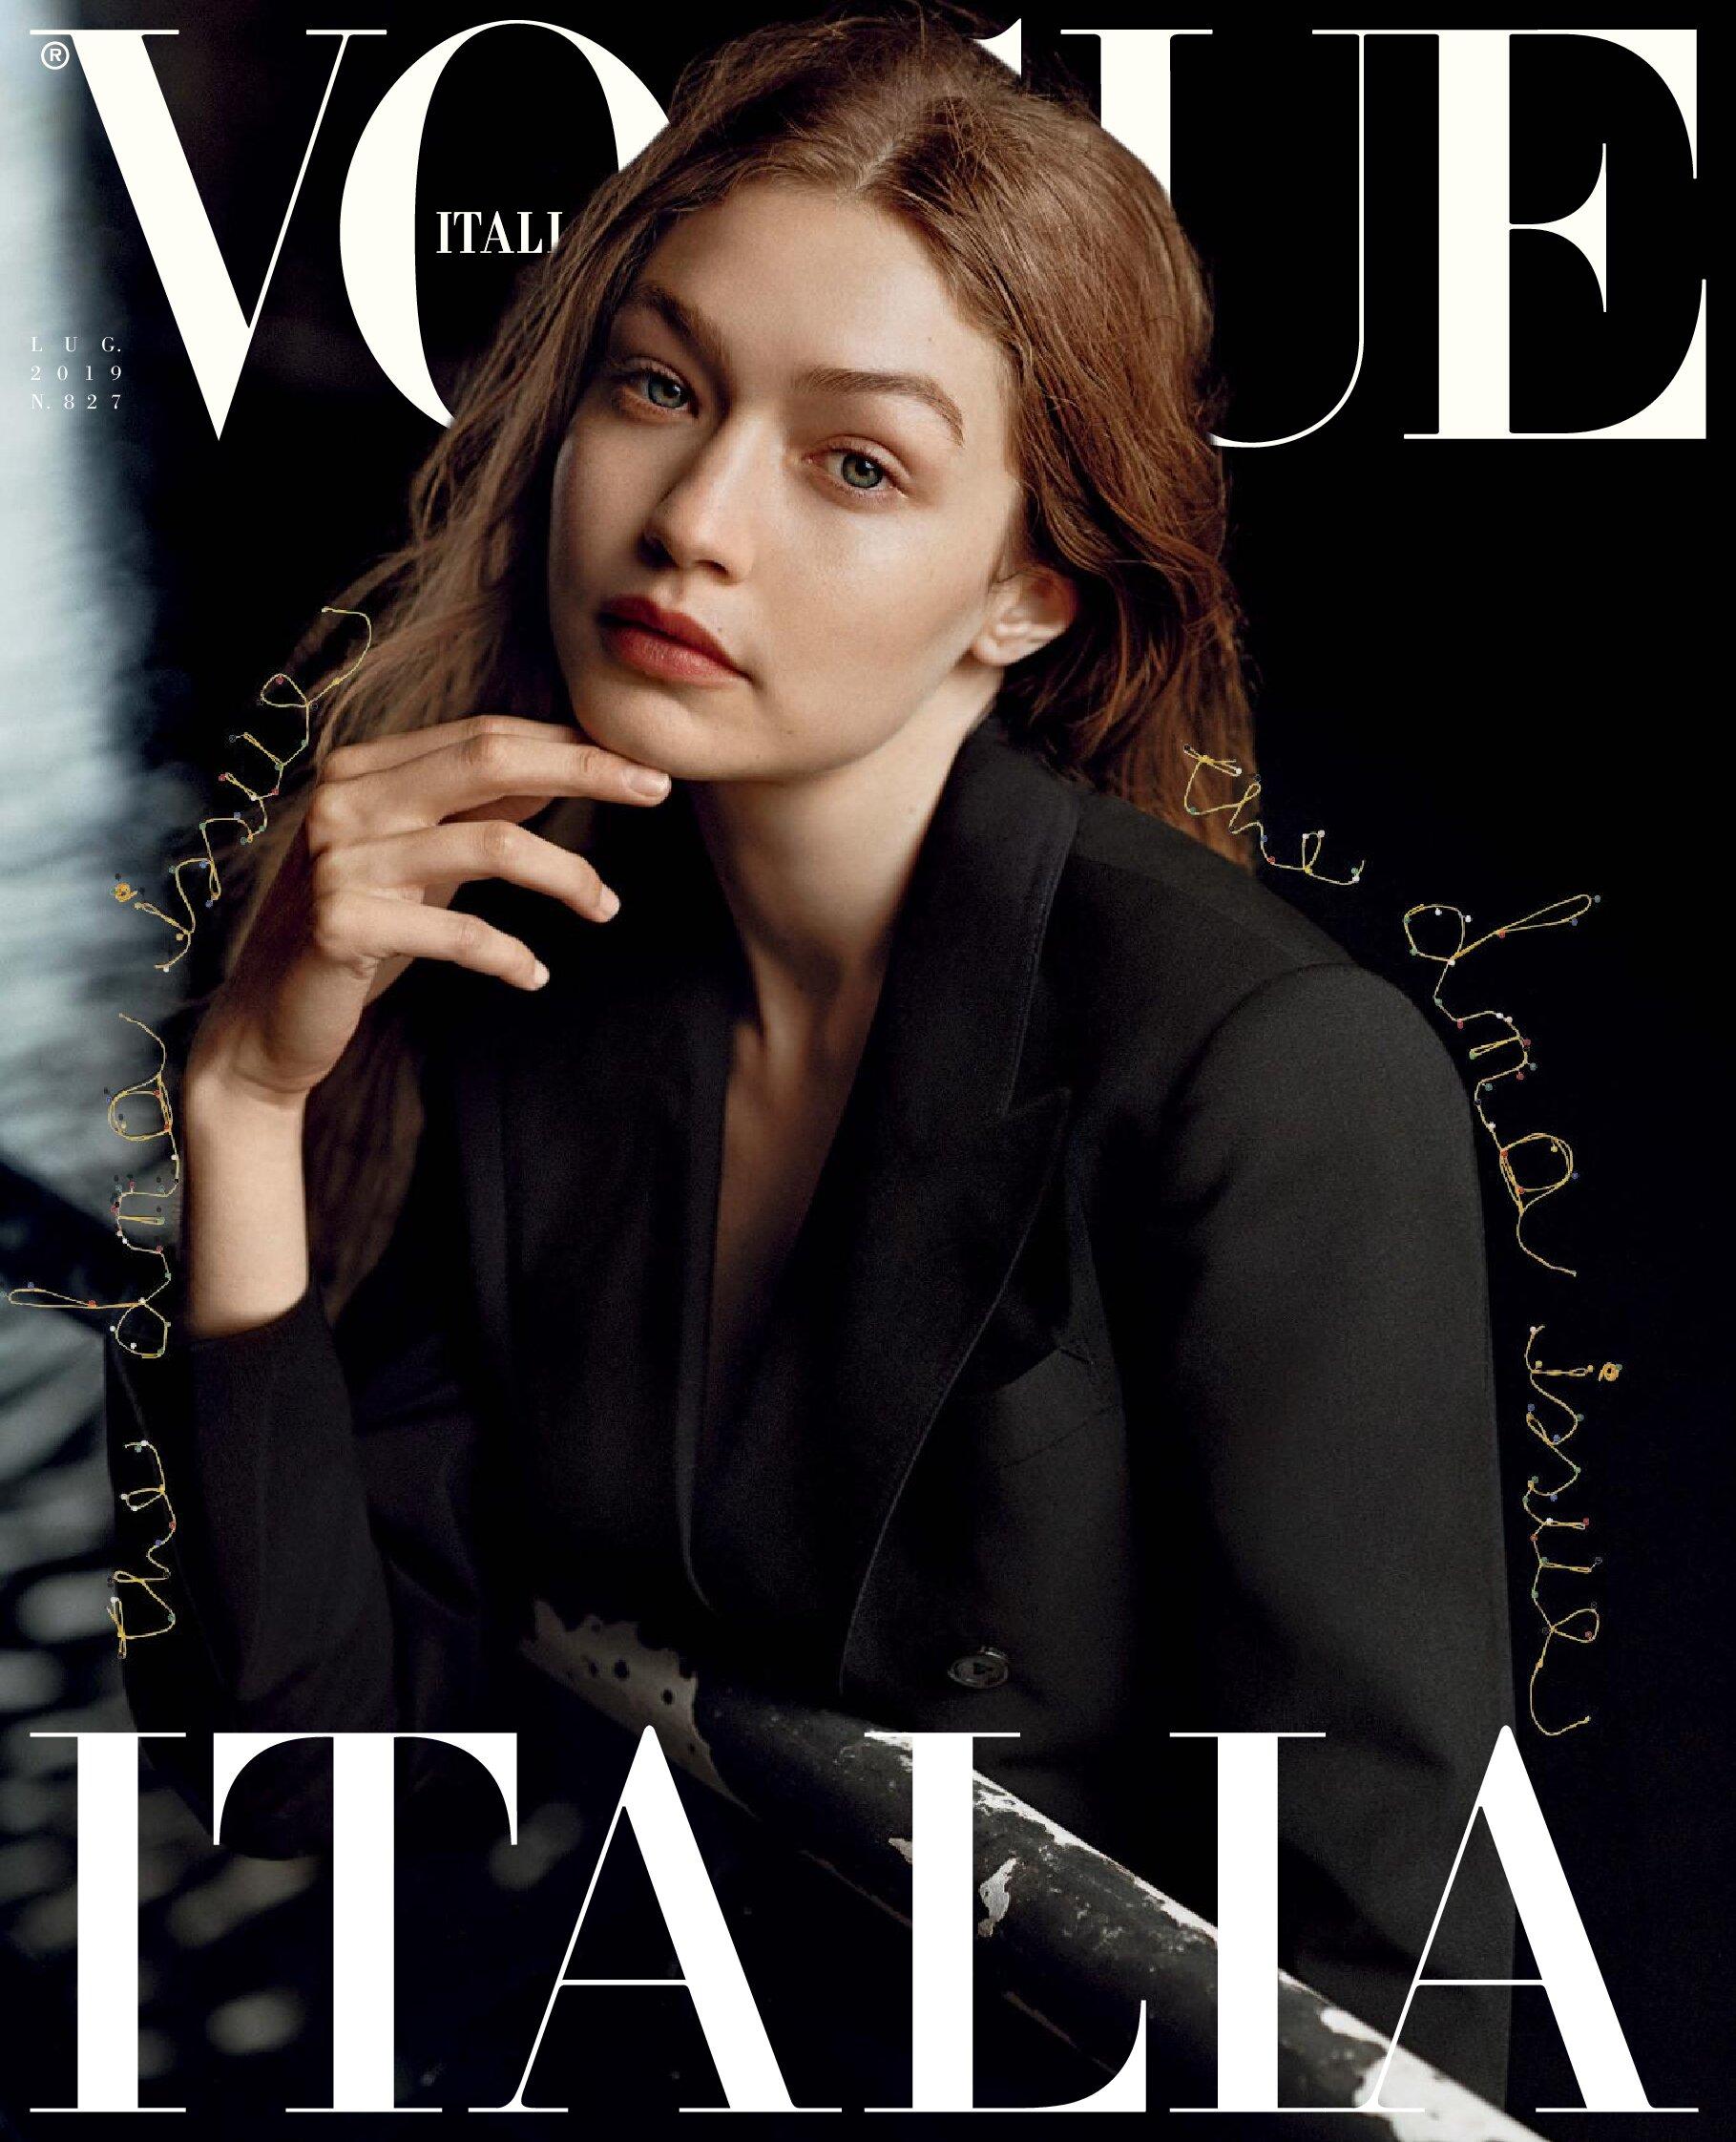 Gigi Hadid by Alasdair McLellan Vogue Italy July 2019 (5).jpg